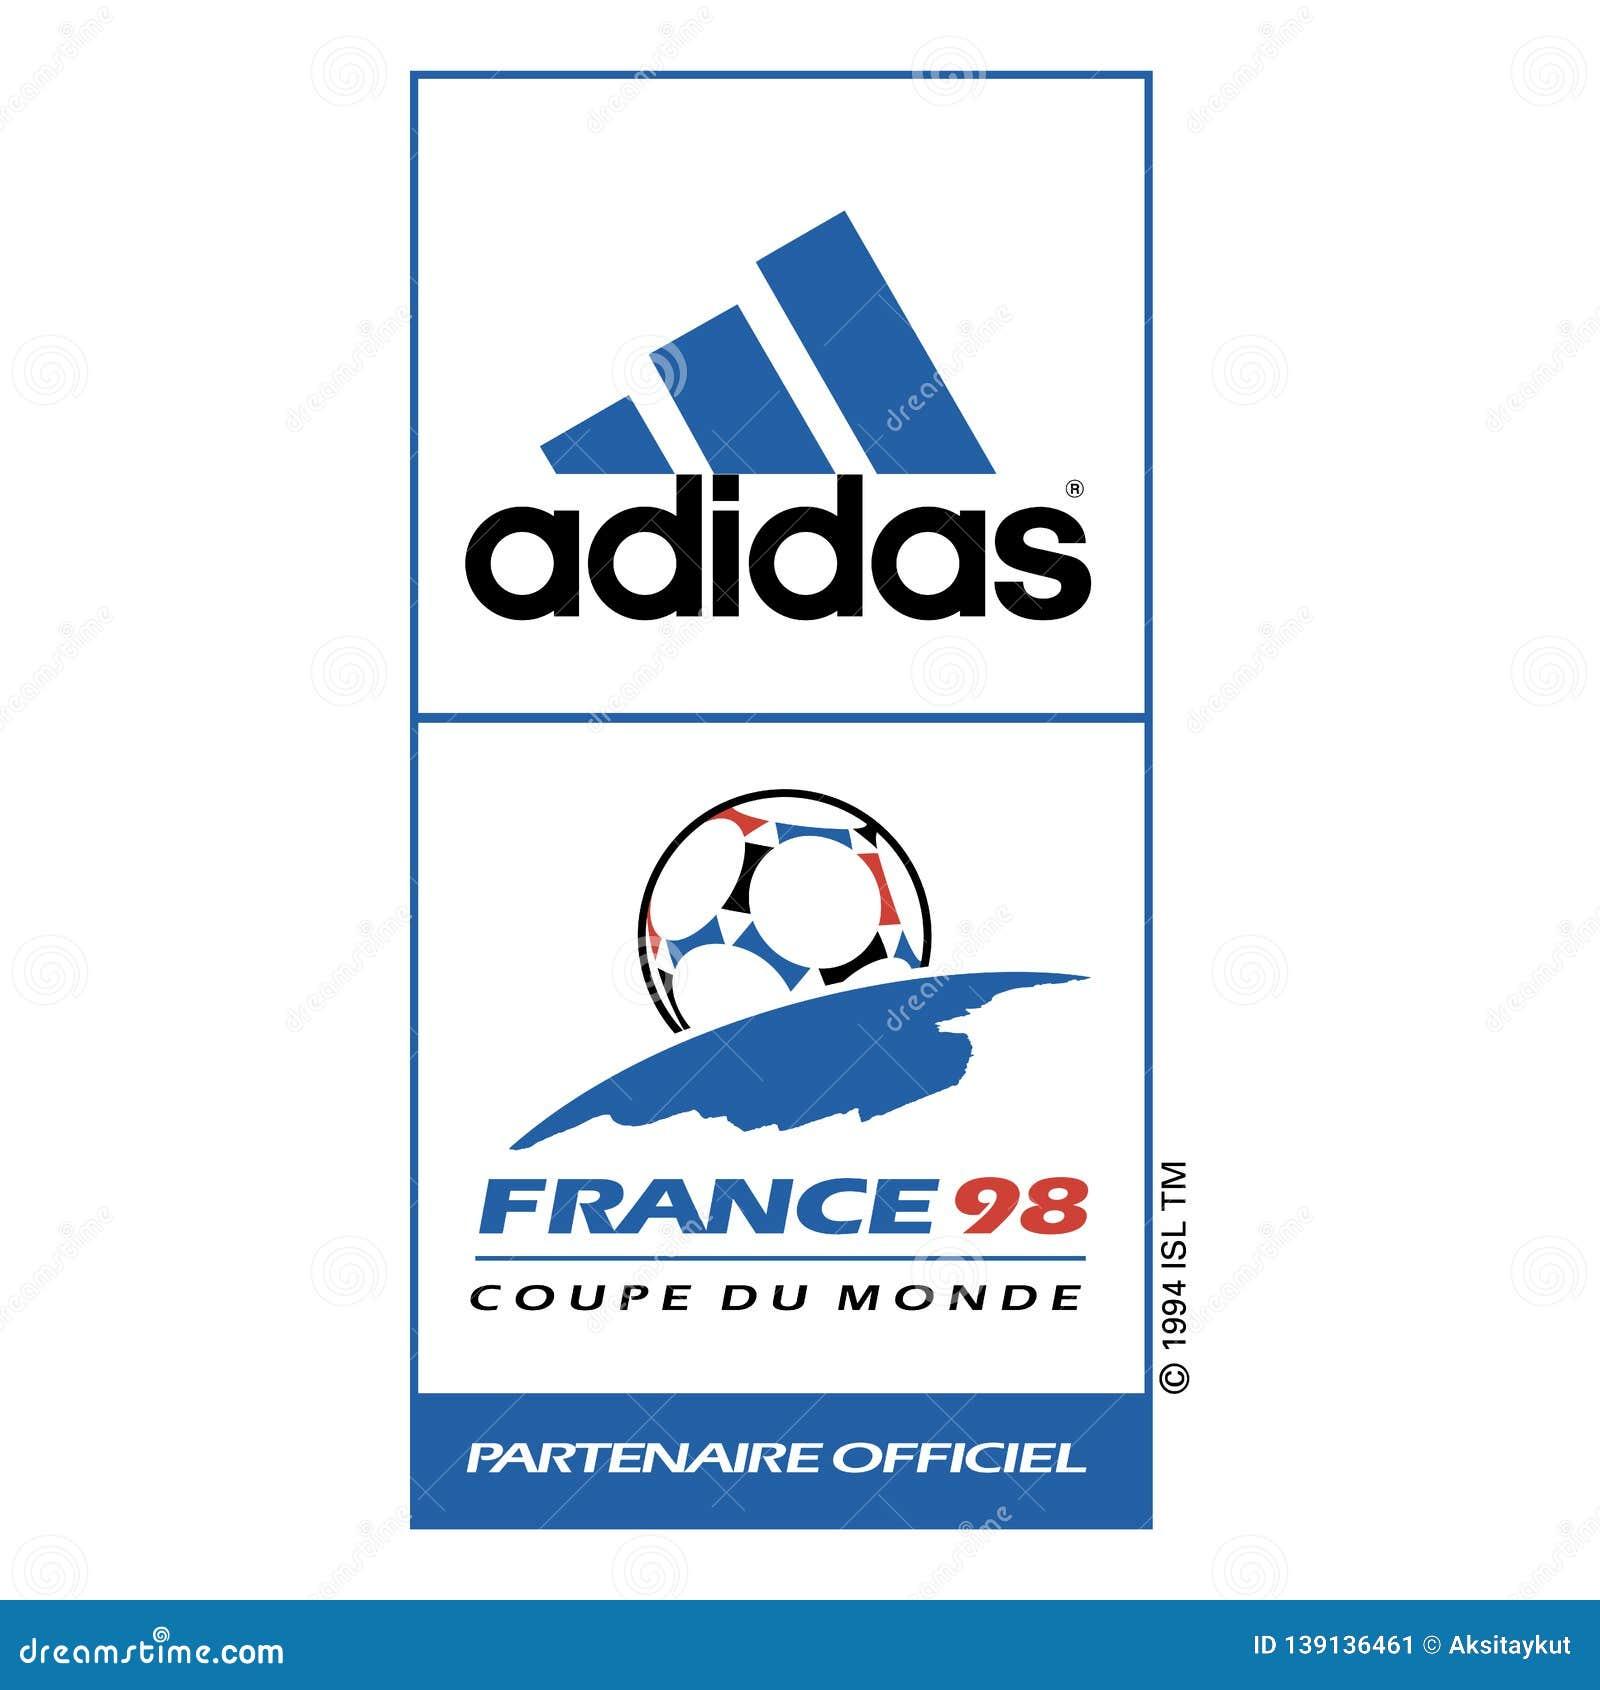 Adidas France98 Sponsor Logo Sports Commercial Editorial